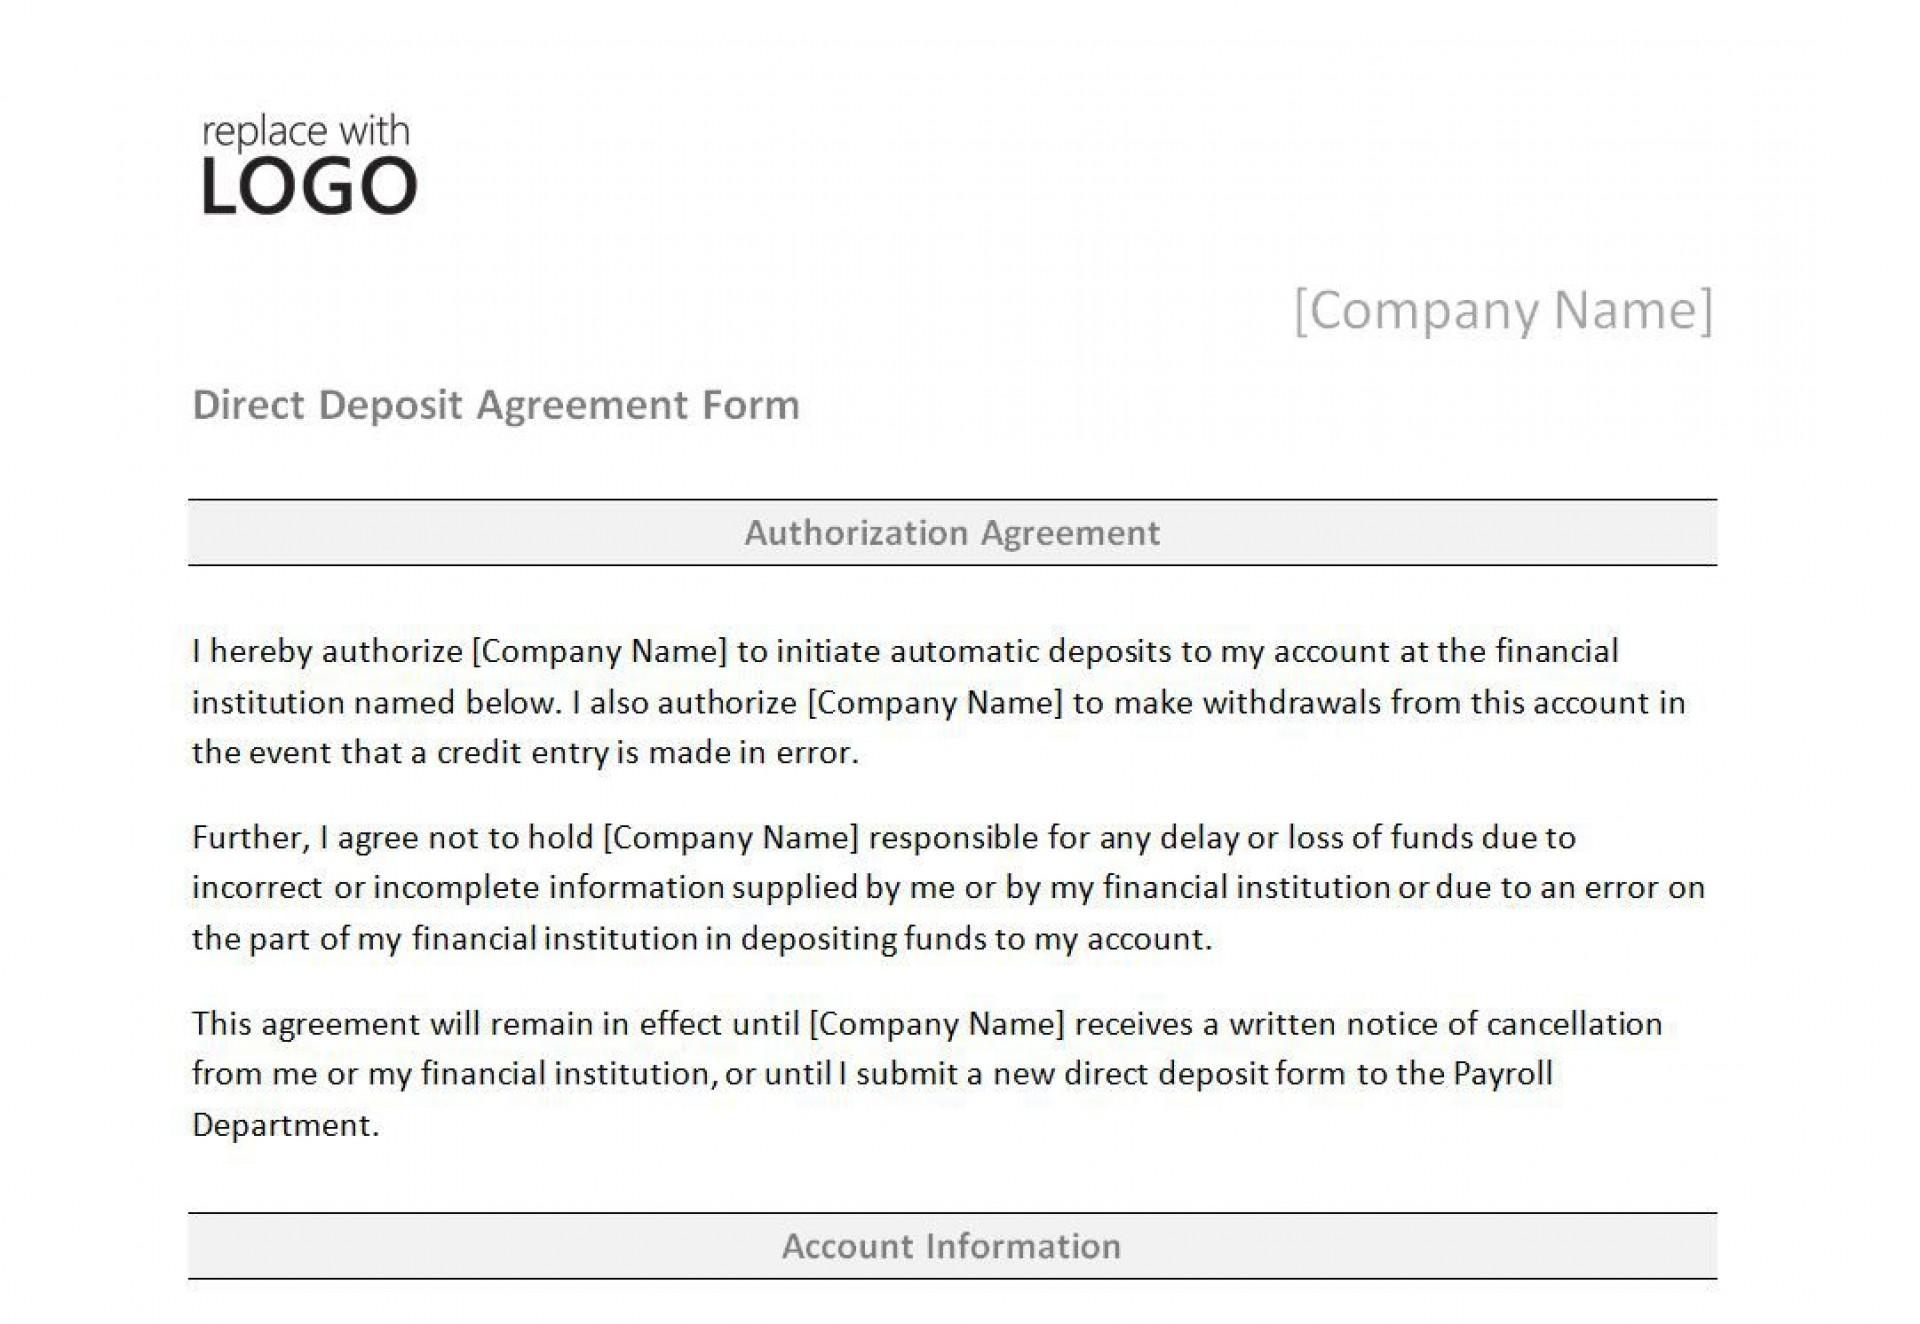 008 Unbelievable Direct Deposit Agreement Authorization Form Template Photo 1920